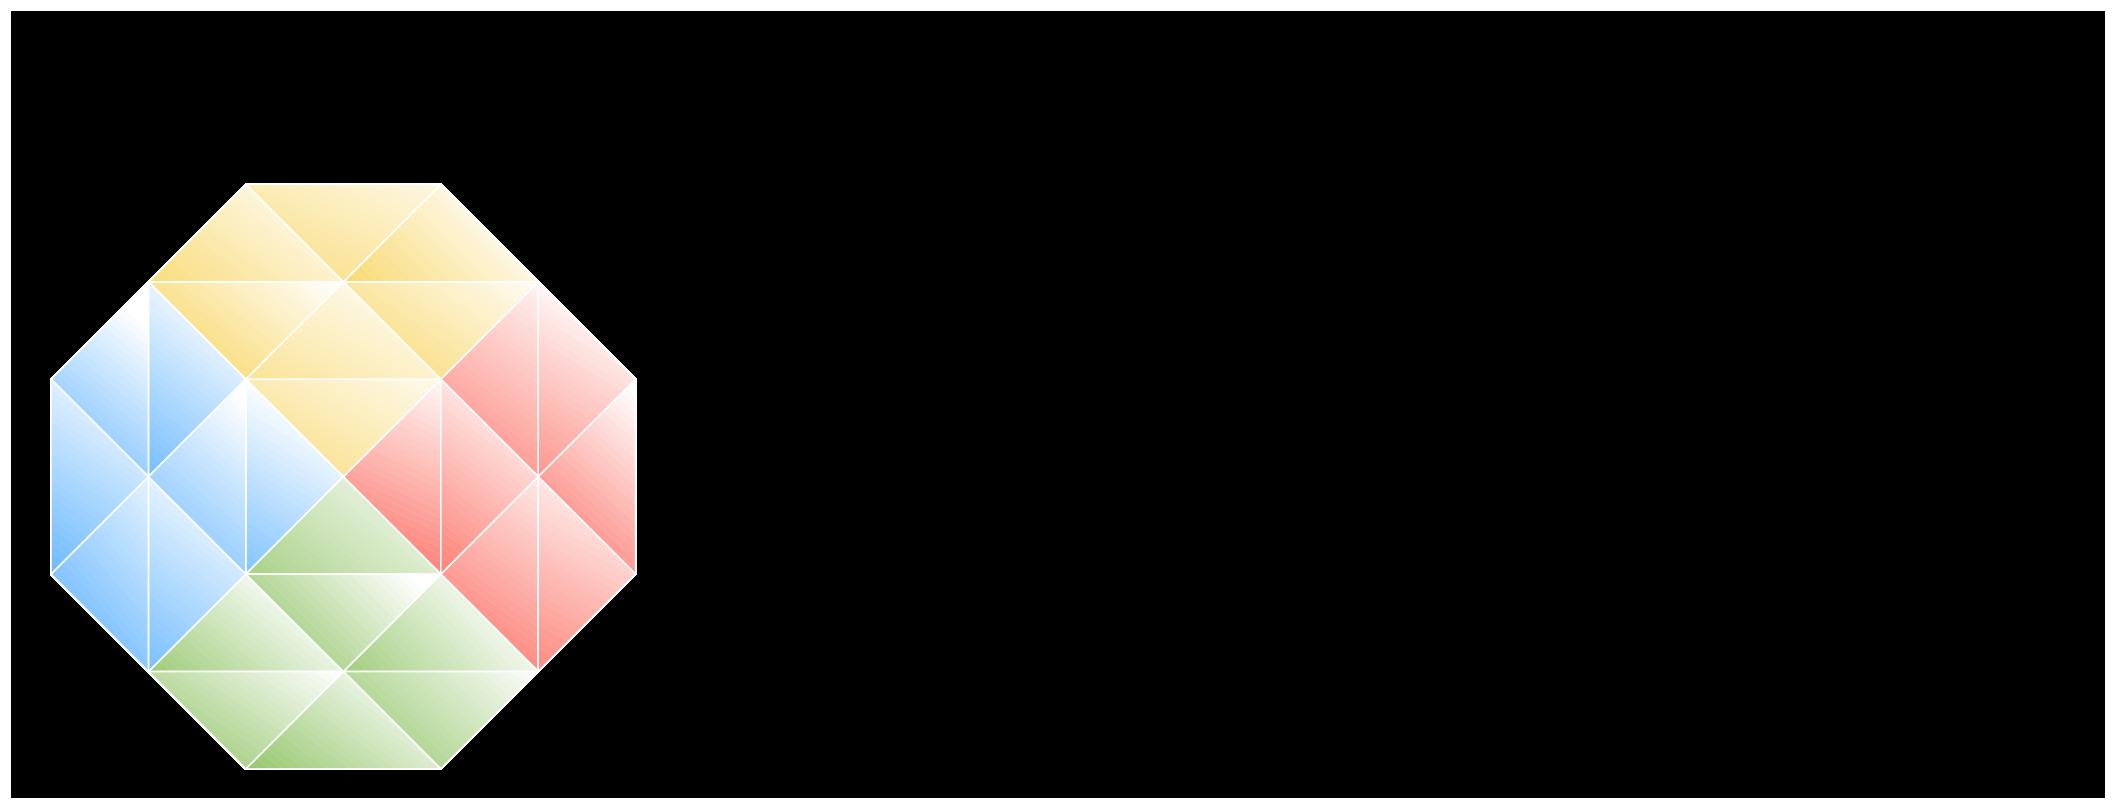 Stiftelsen Byggekologi